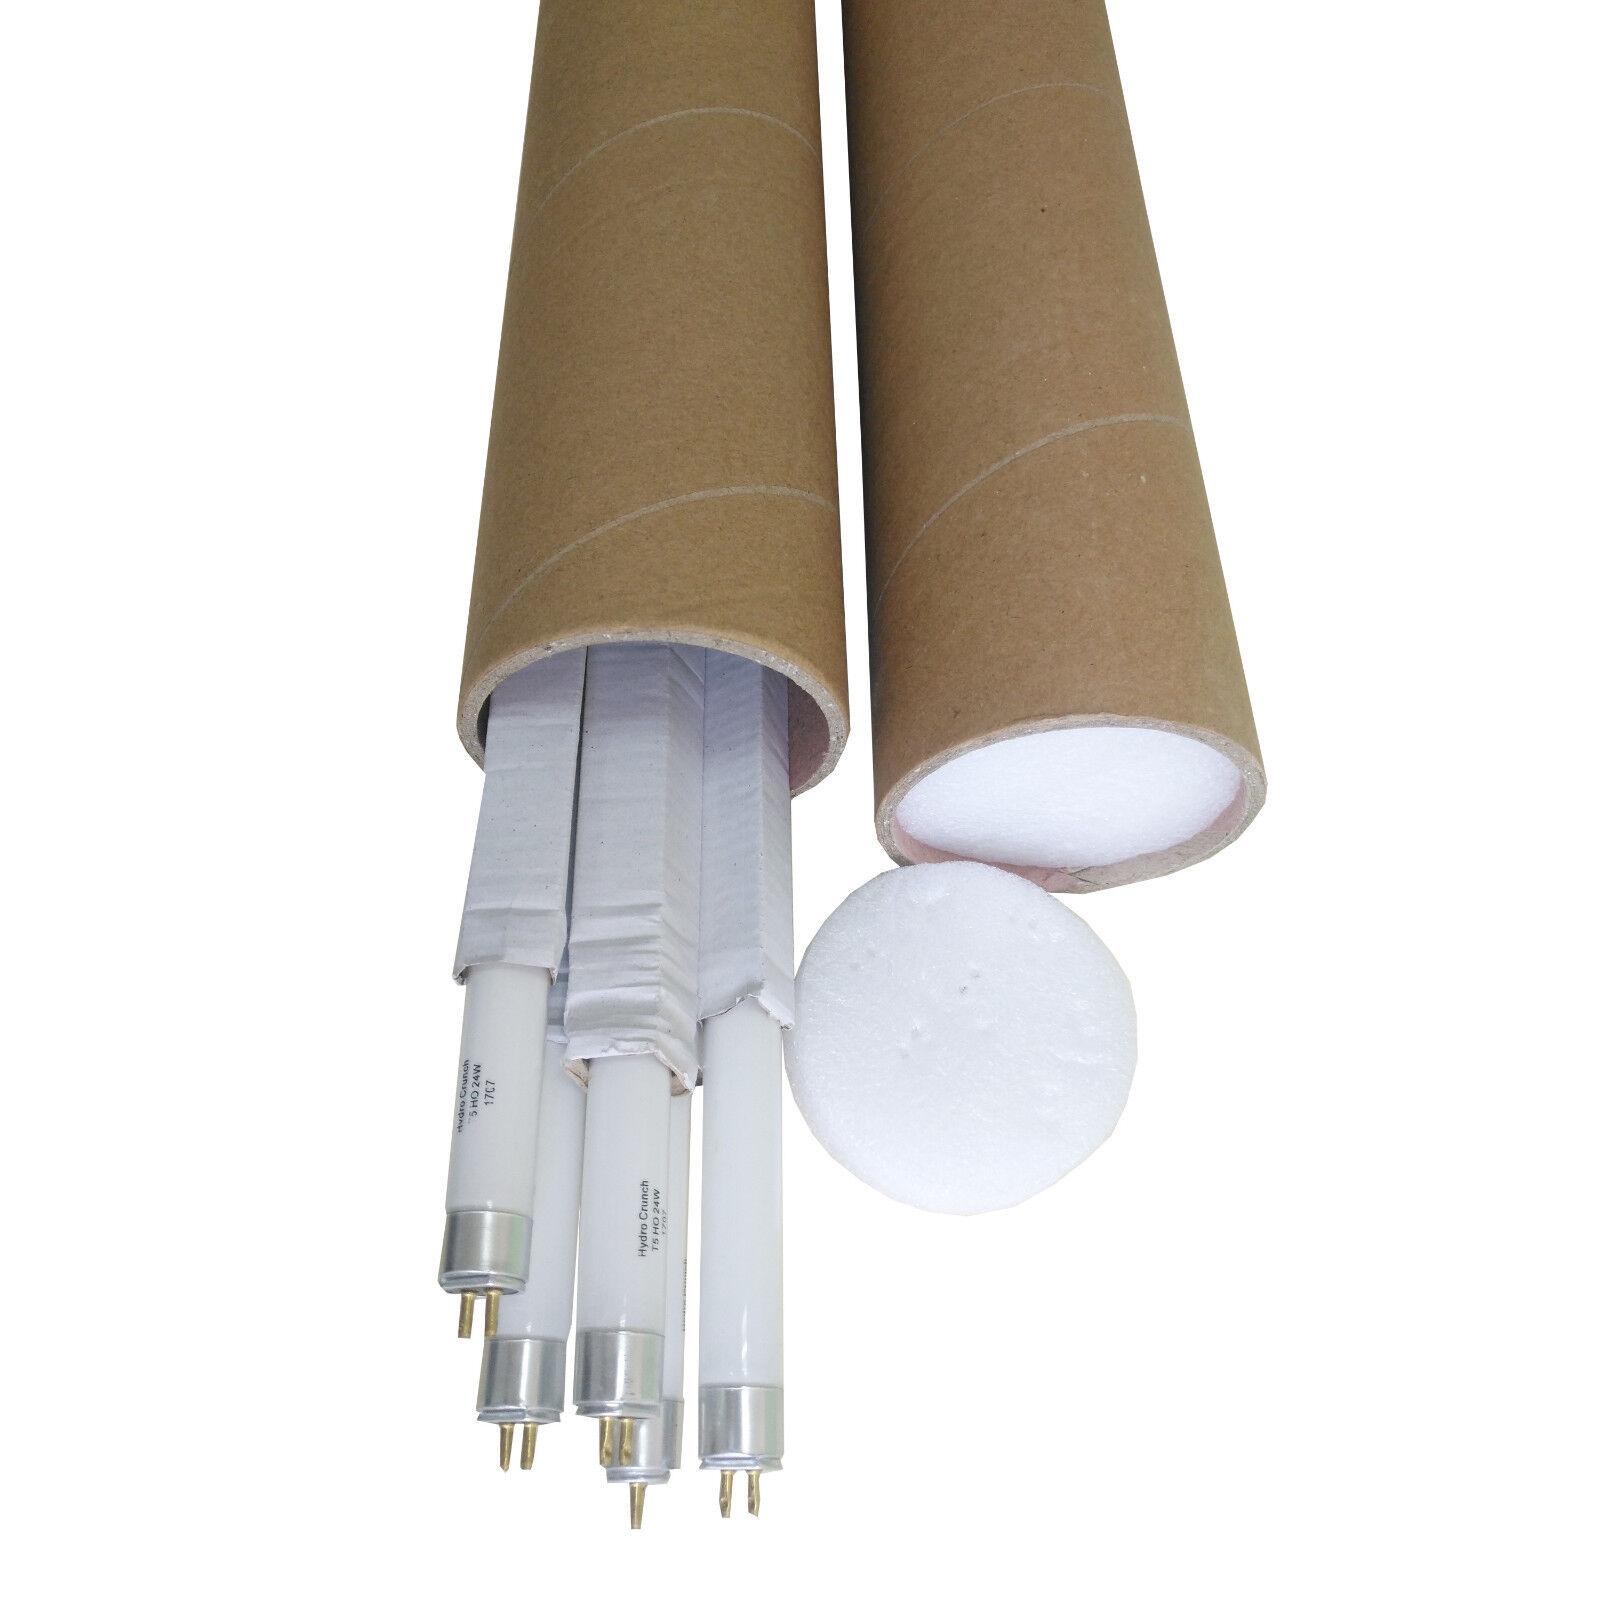 4 Pack T5 Bulb 54w Aquarium Light Bulb Ho For 48 4 Ft: Digital Grow 2 FT 4 FT 6400K 24W 54W T5 Fluorescent Grow